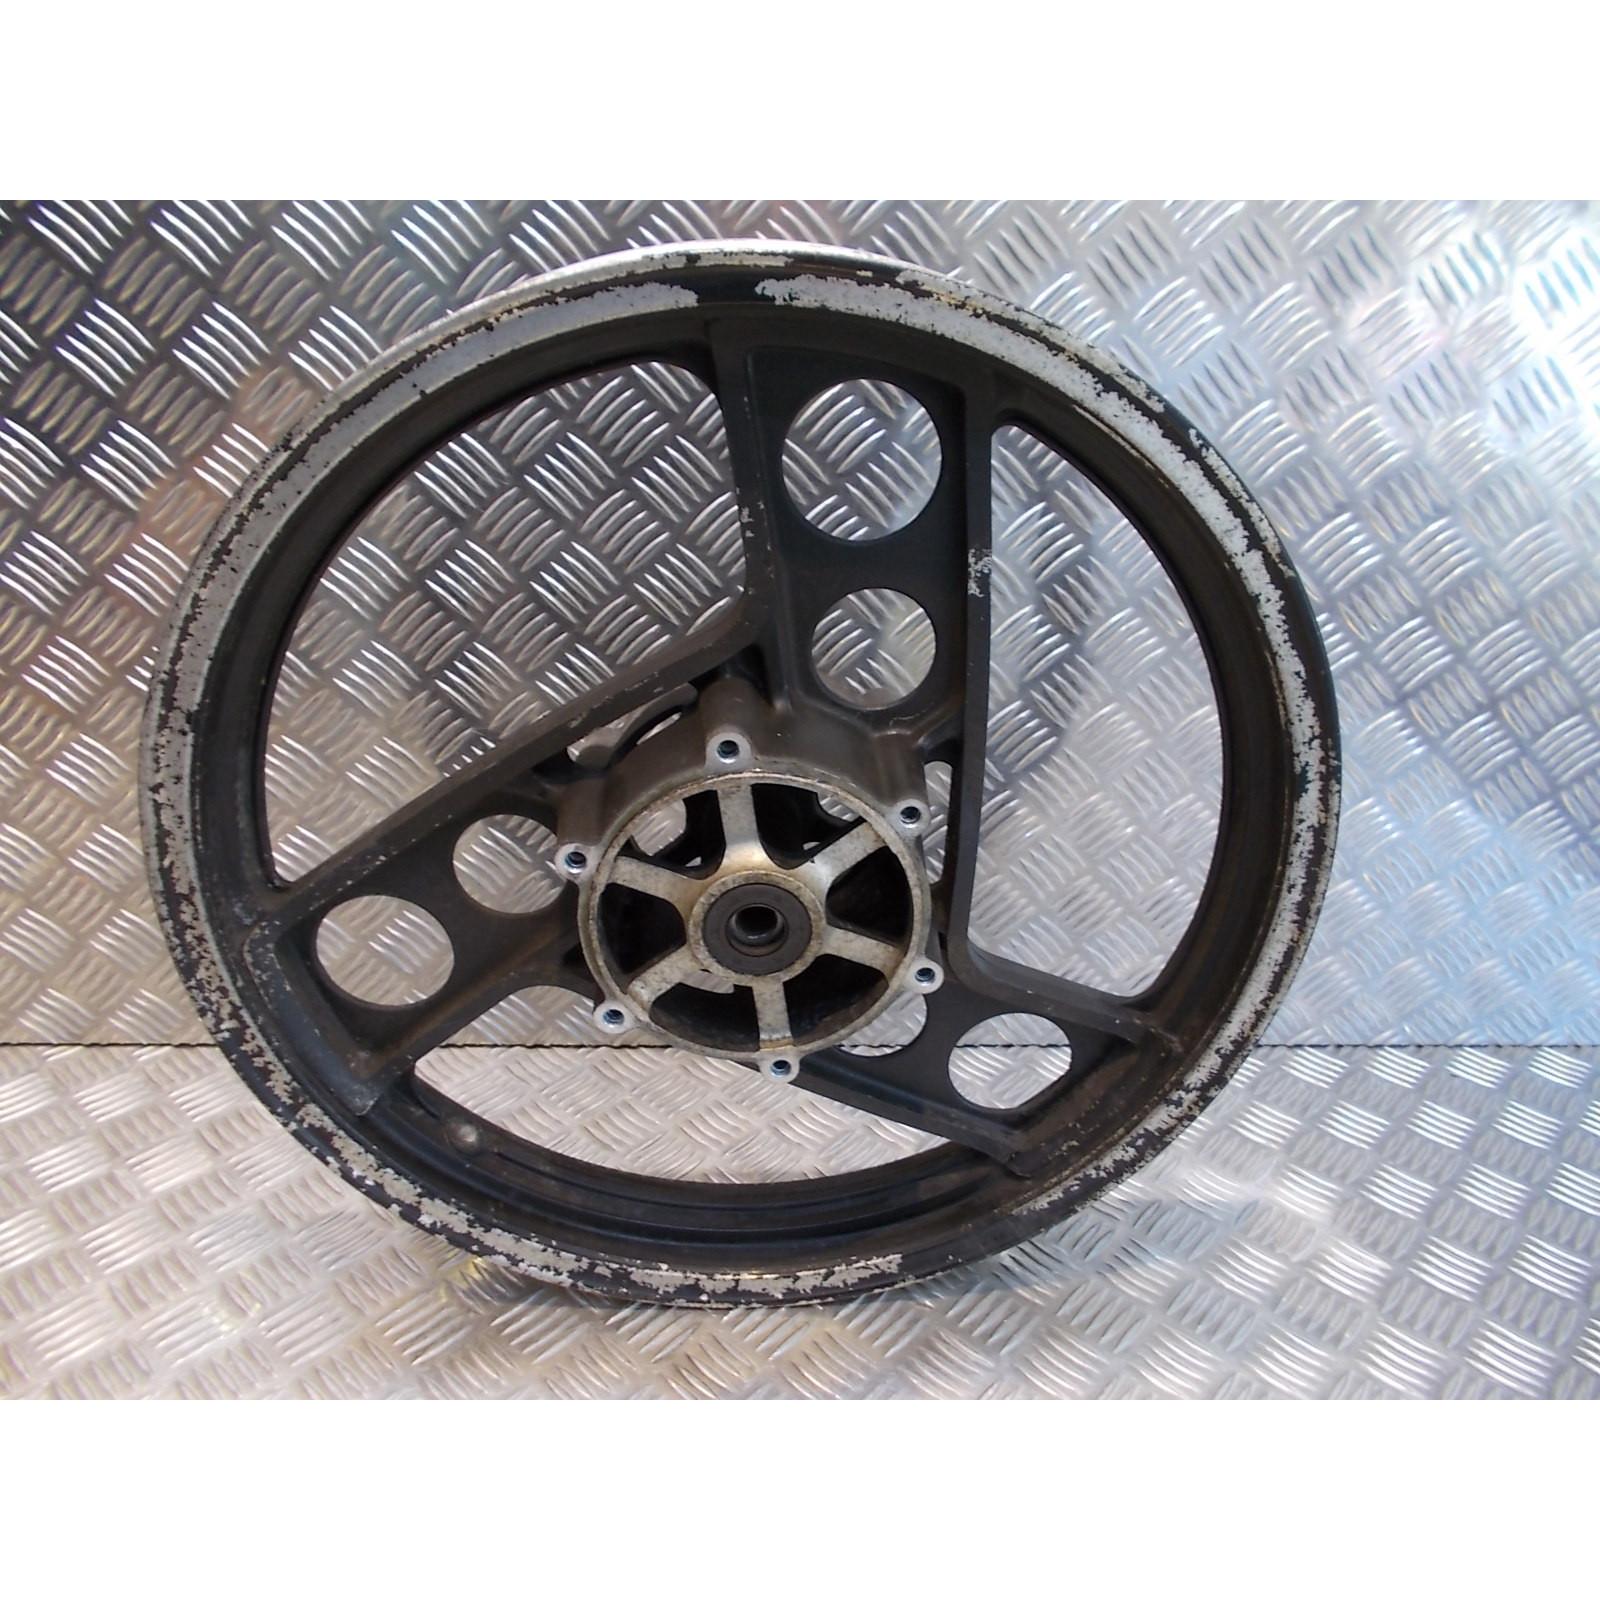 jante roue avant moto yamaha 600 xj 51j